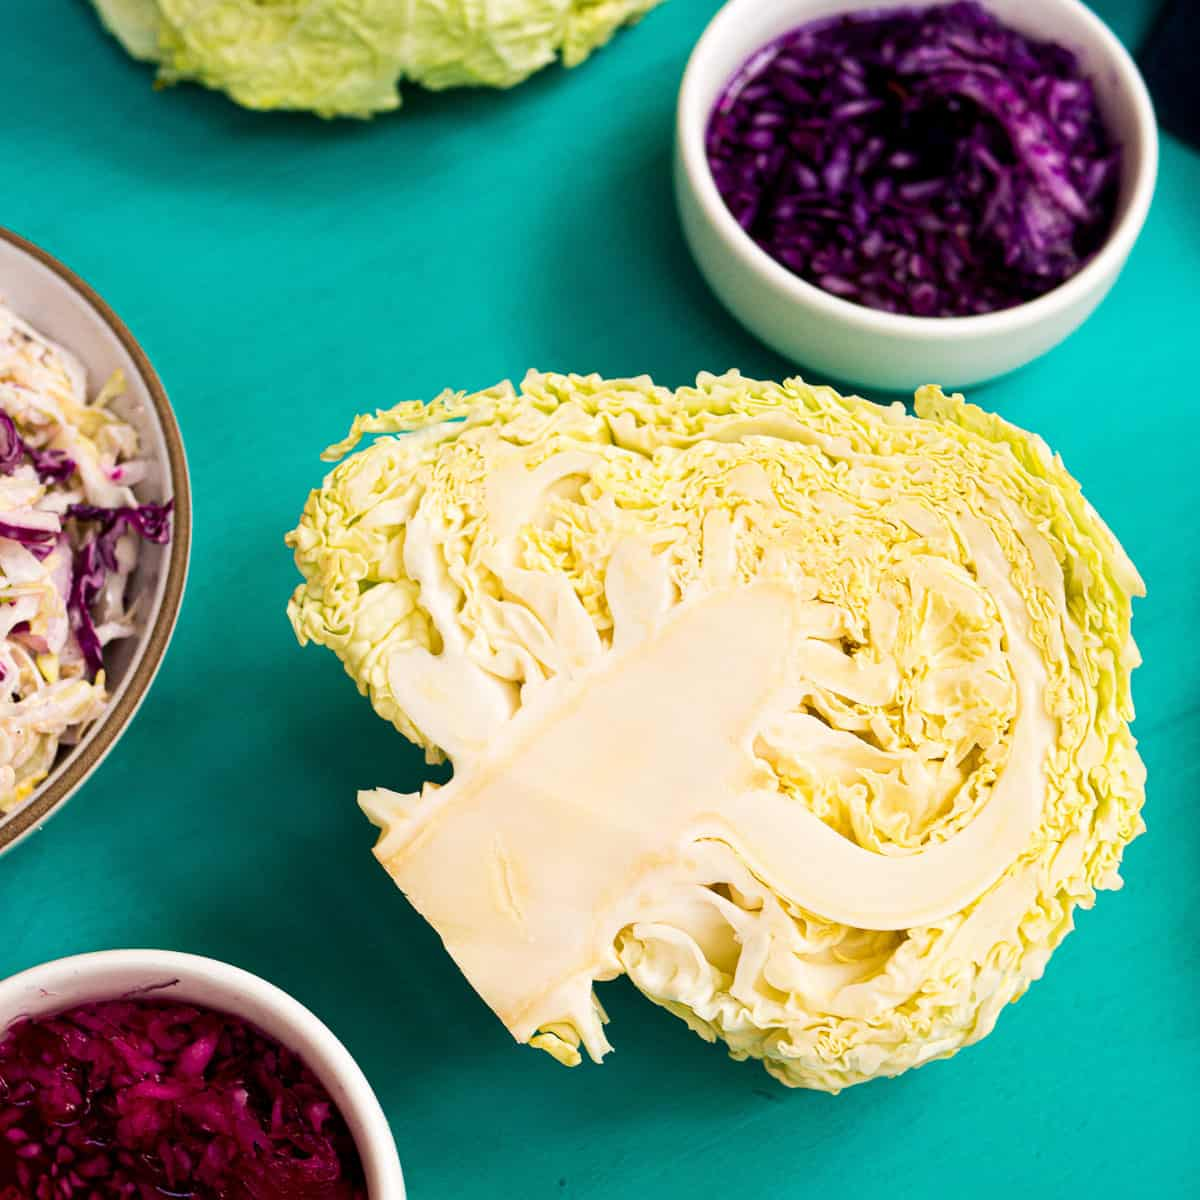 A savoy cabbage cut in half